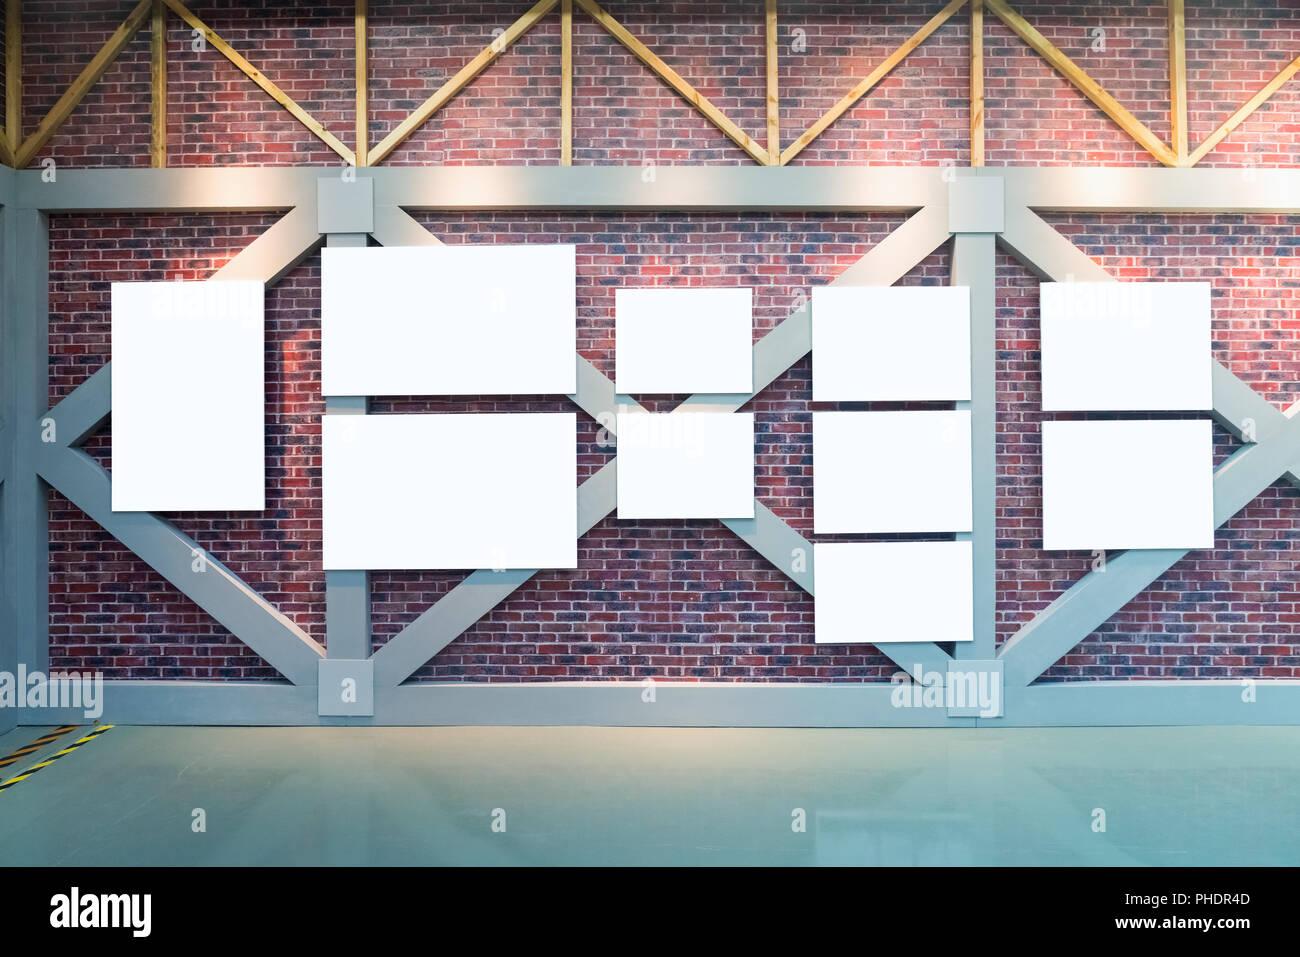 blank frames on brick wall - Stock Image